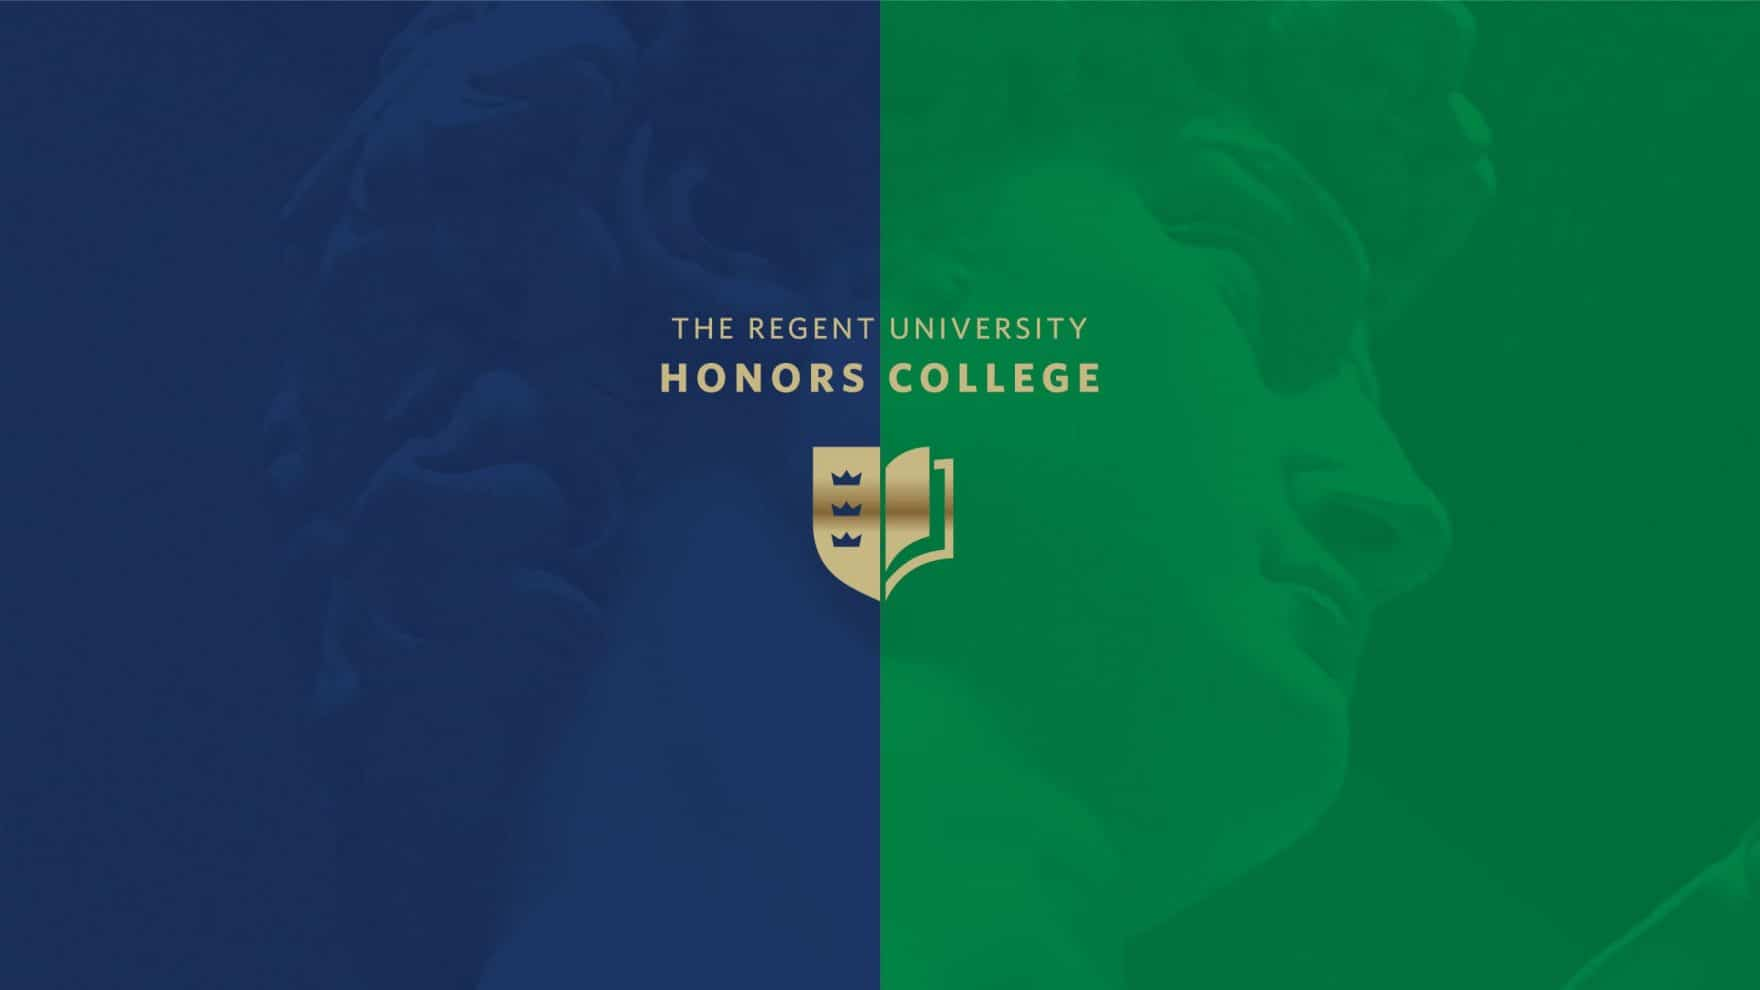 The Regent University Honors College.